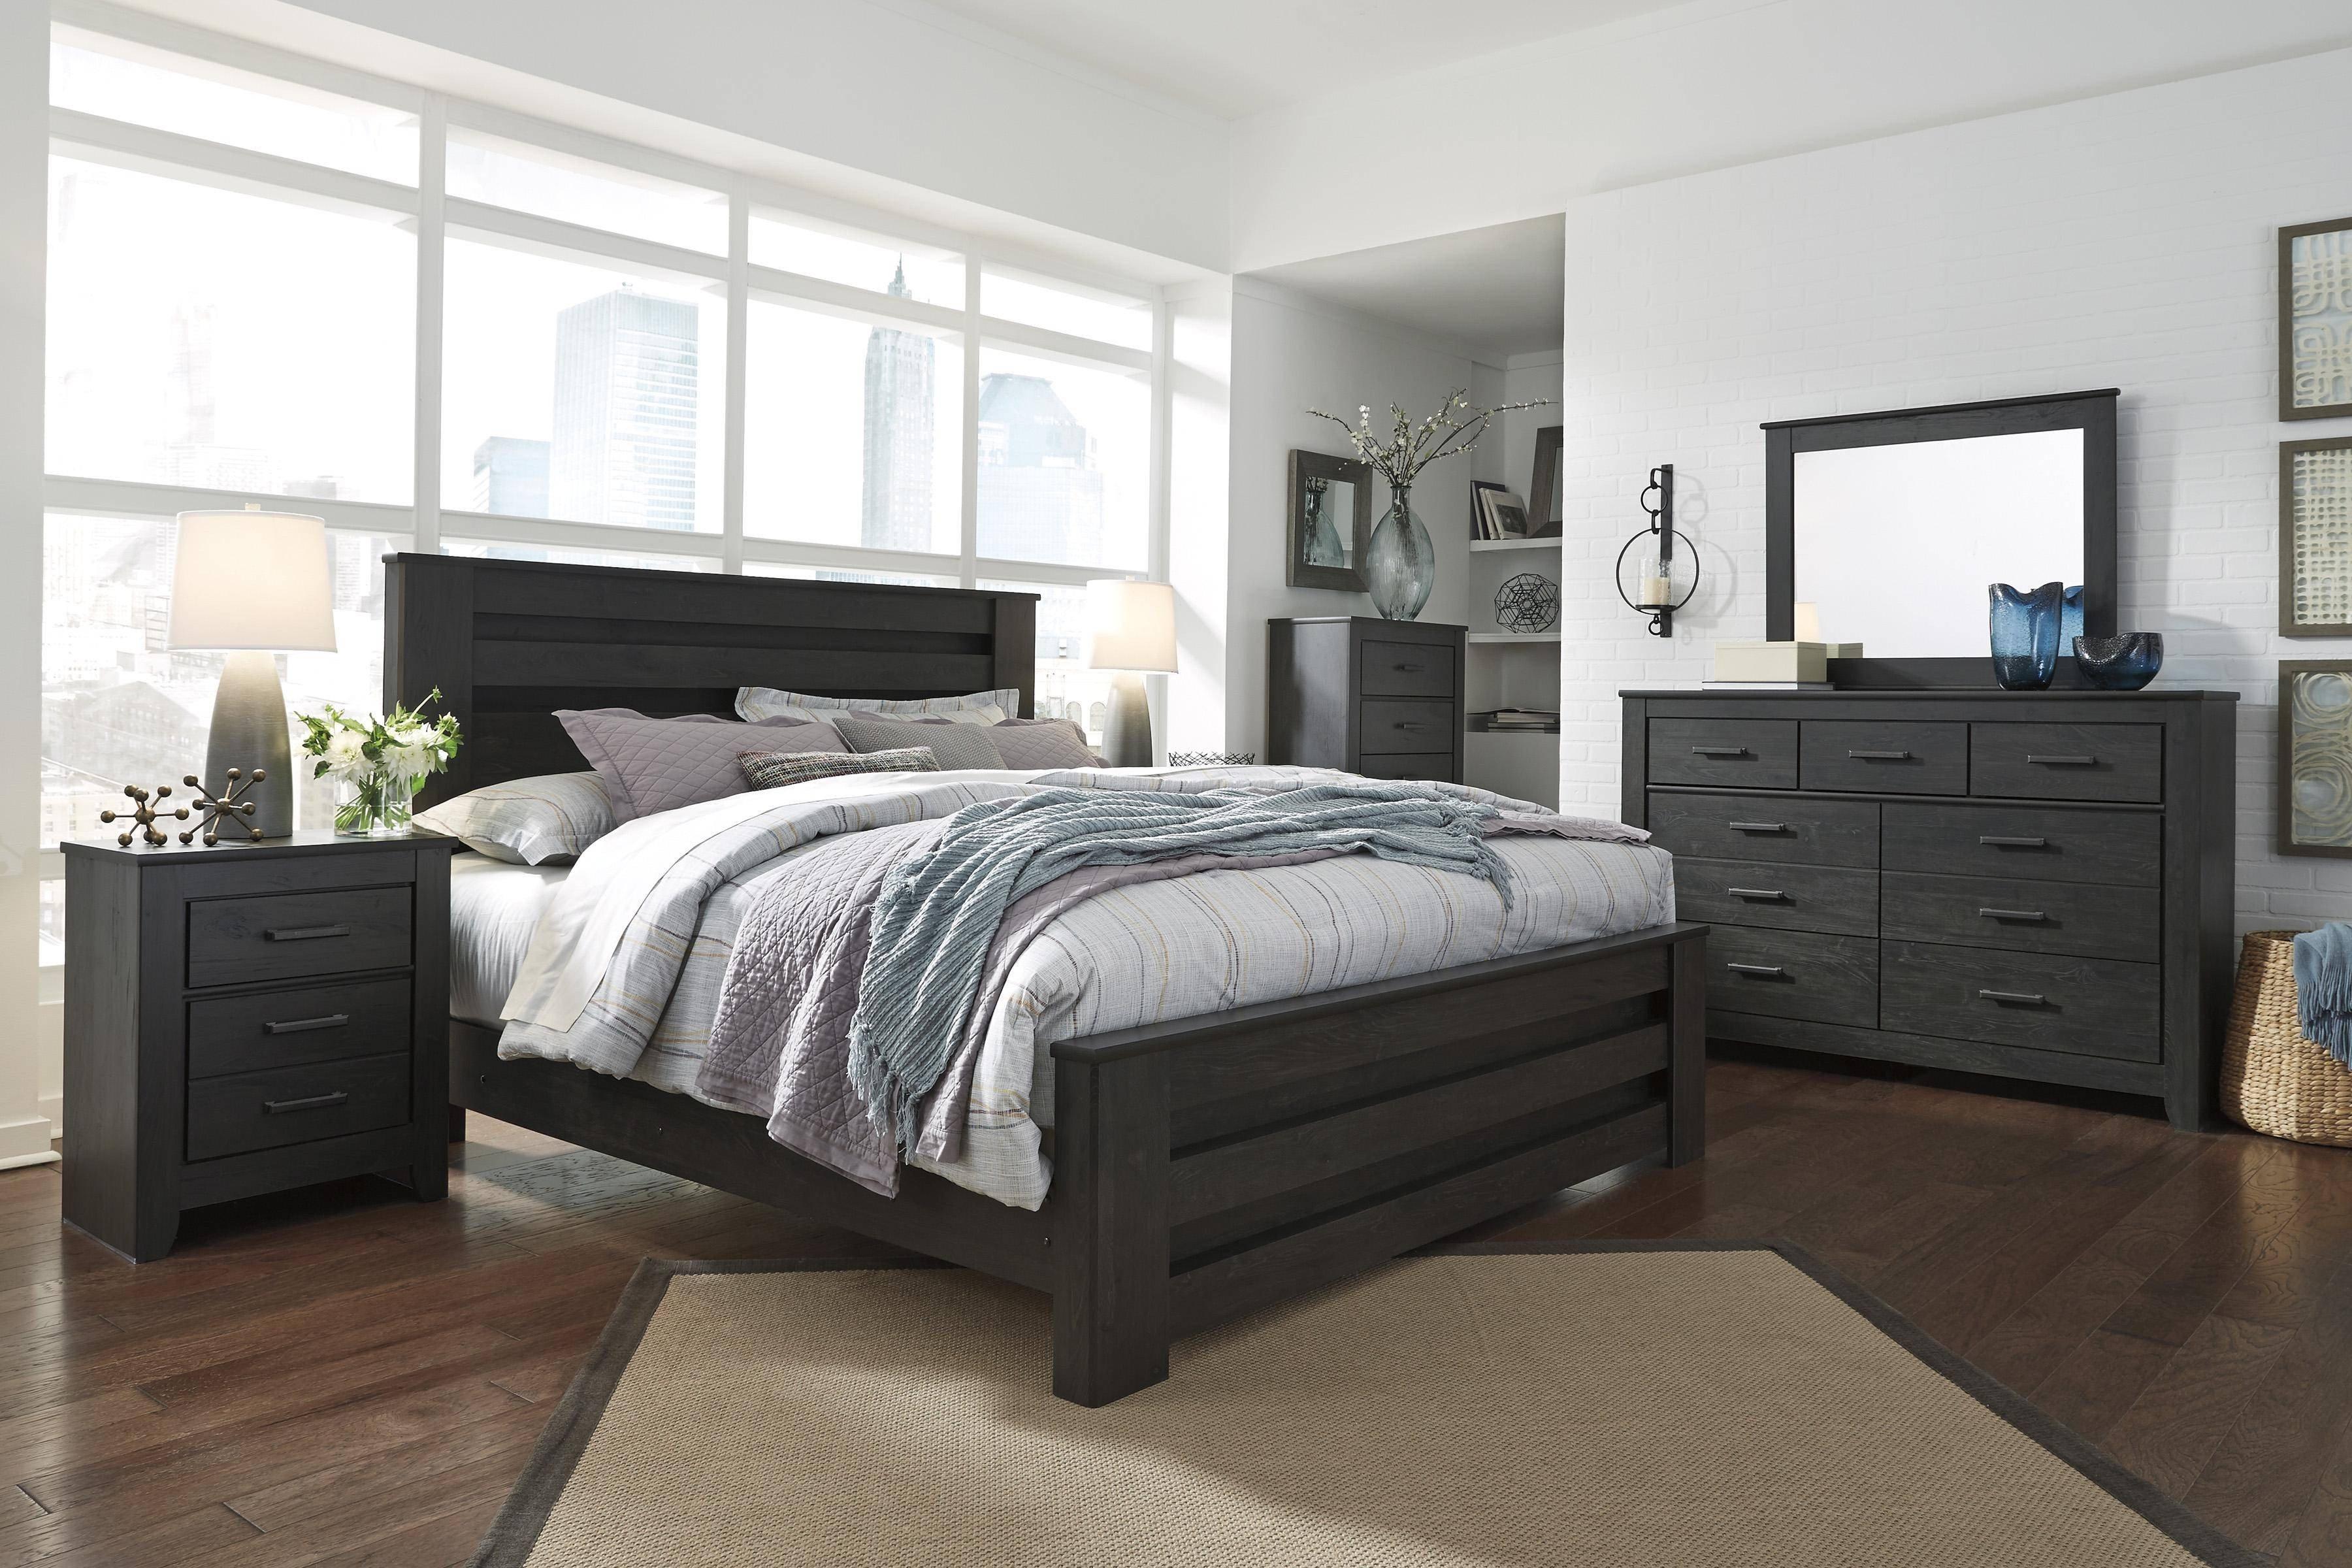 Ashley Furniture Full Size Bedroom Set Inspirational ashley Brinxton B249 King Size Platform Bedroom Set 5pcs In